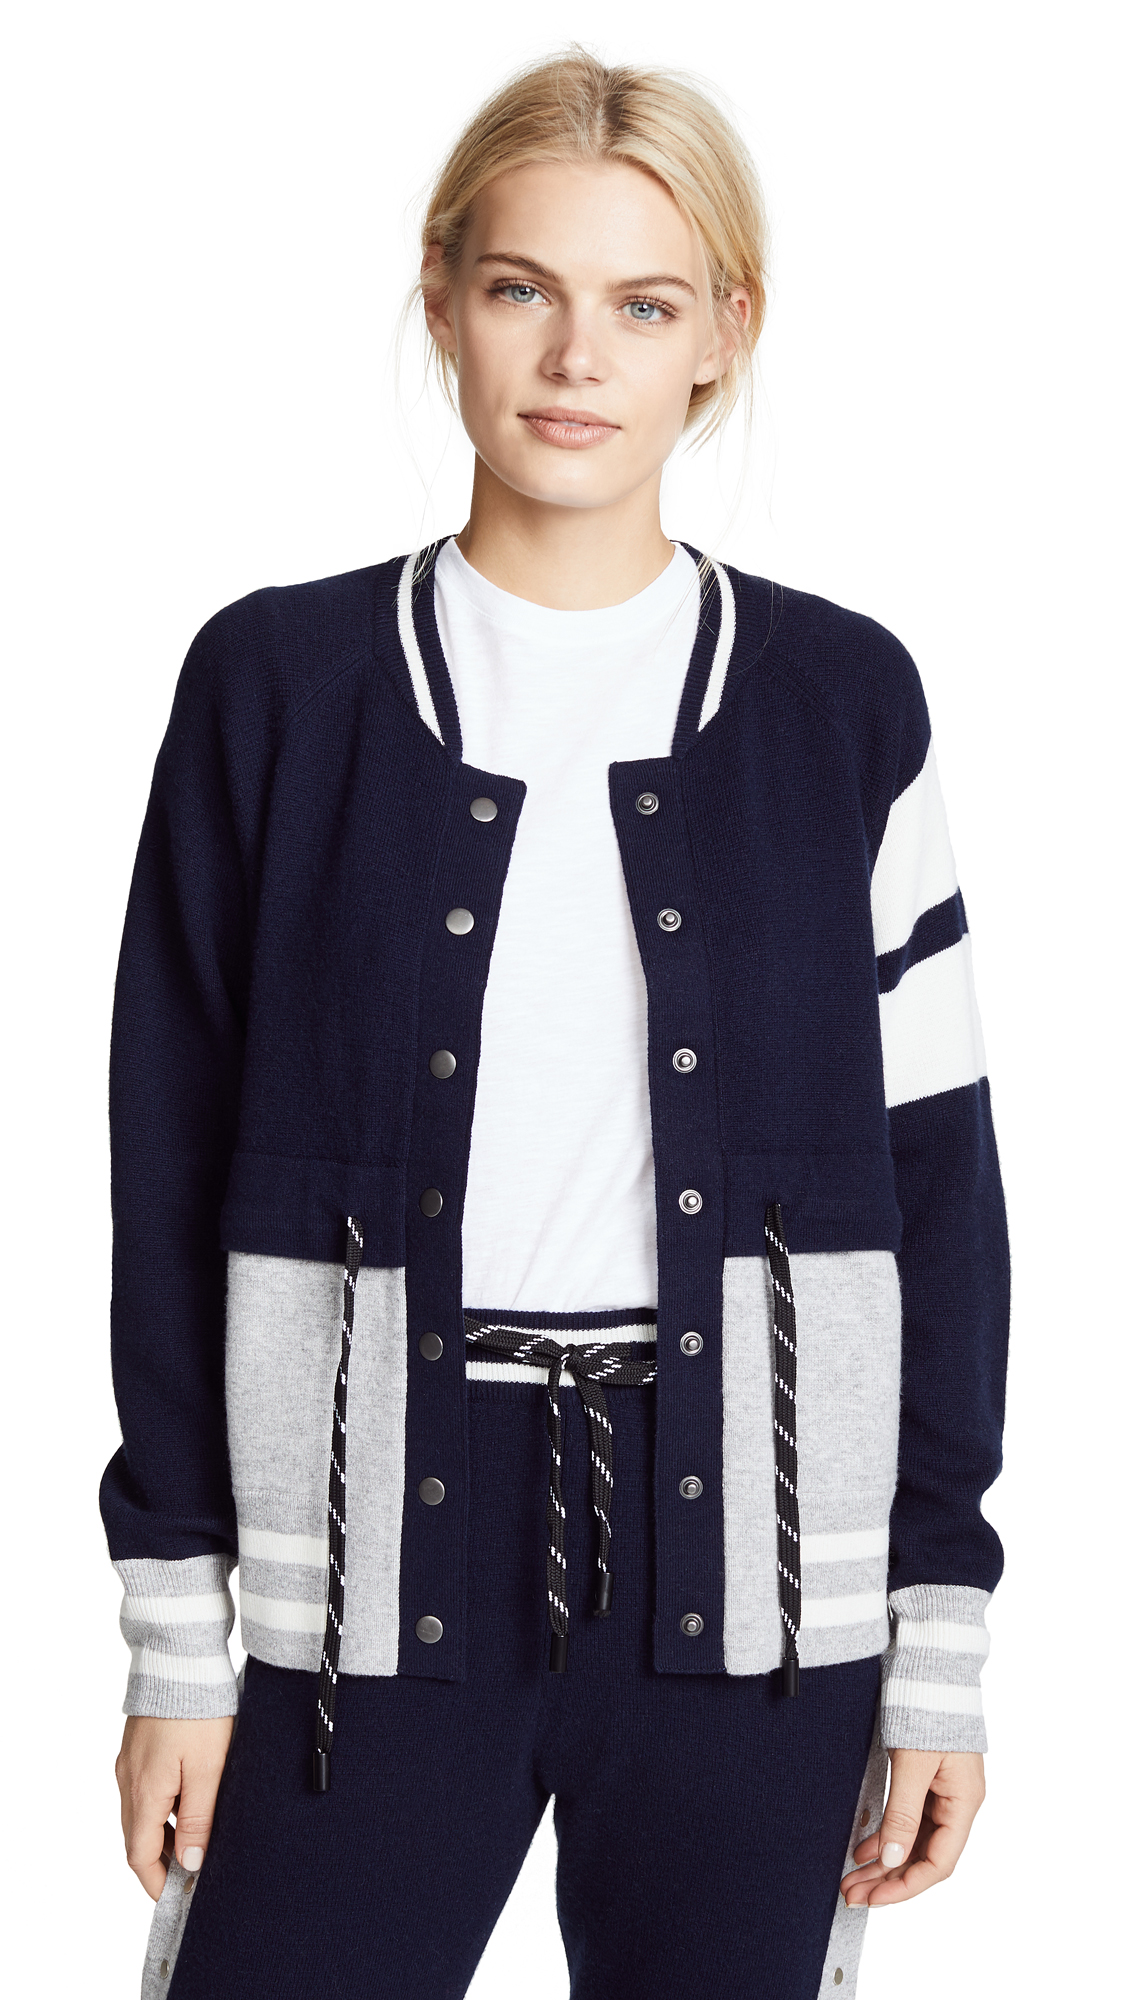 Zoe Jordan Wool Bomber Jacket In Navy